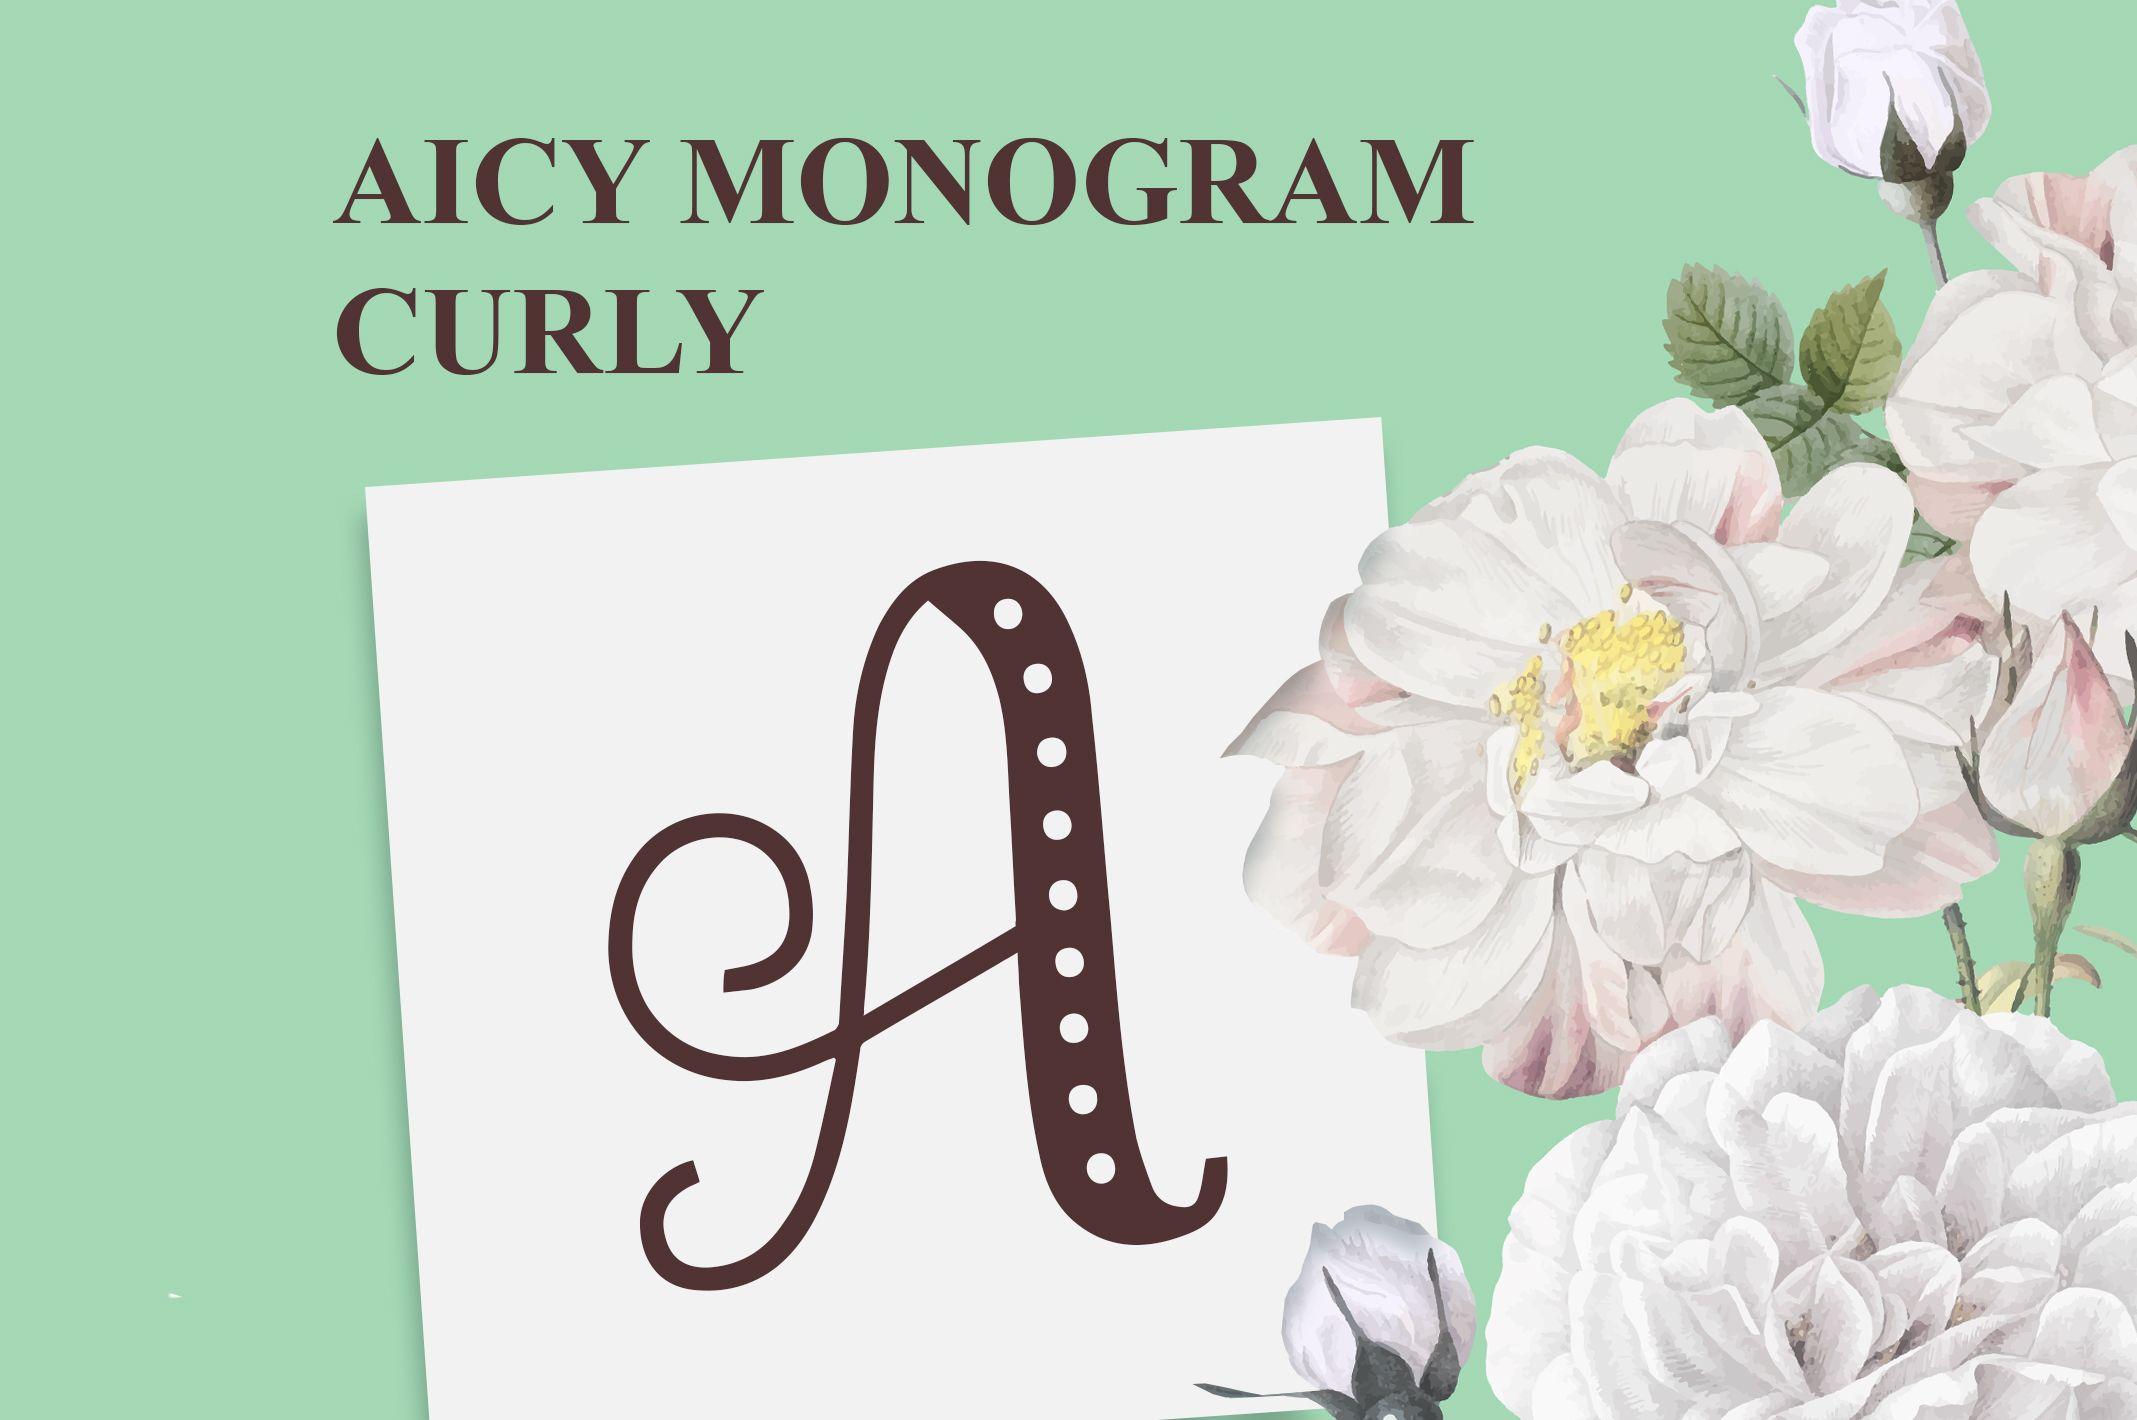 Aicy Monogram Curly (Font) by Typefar